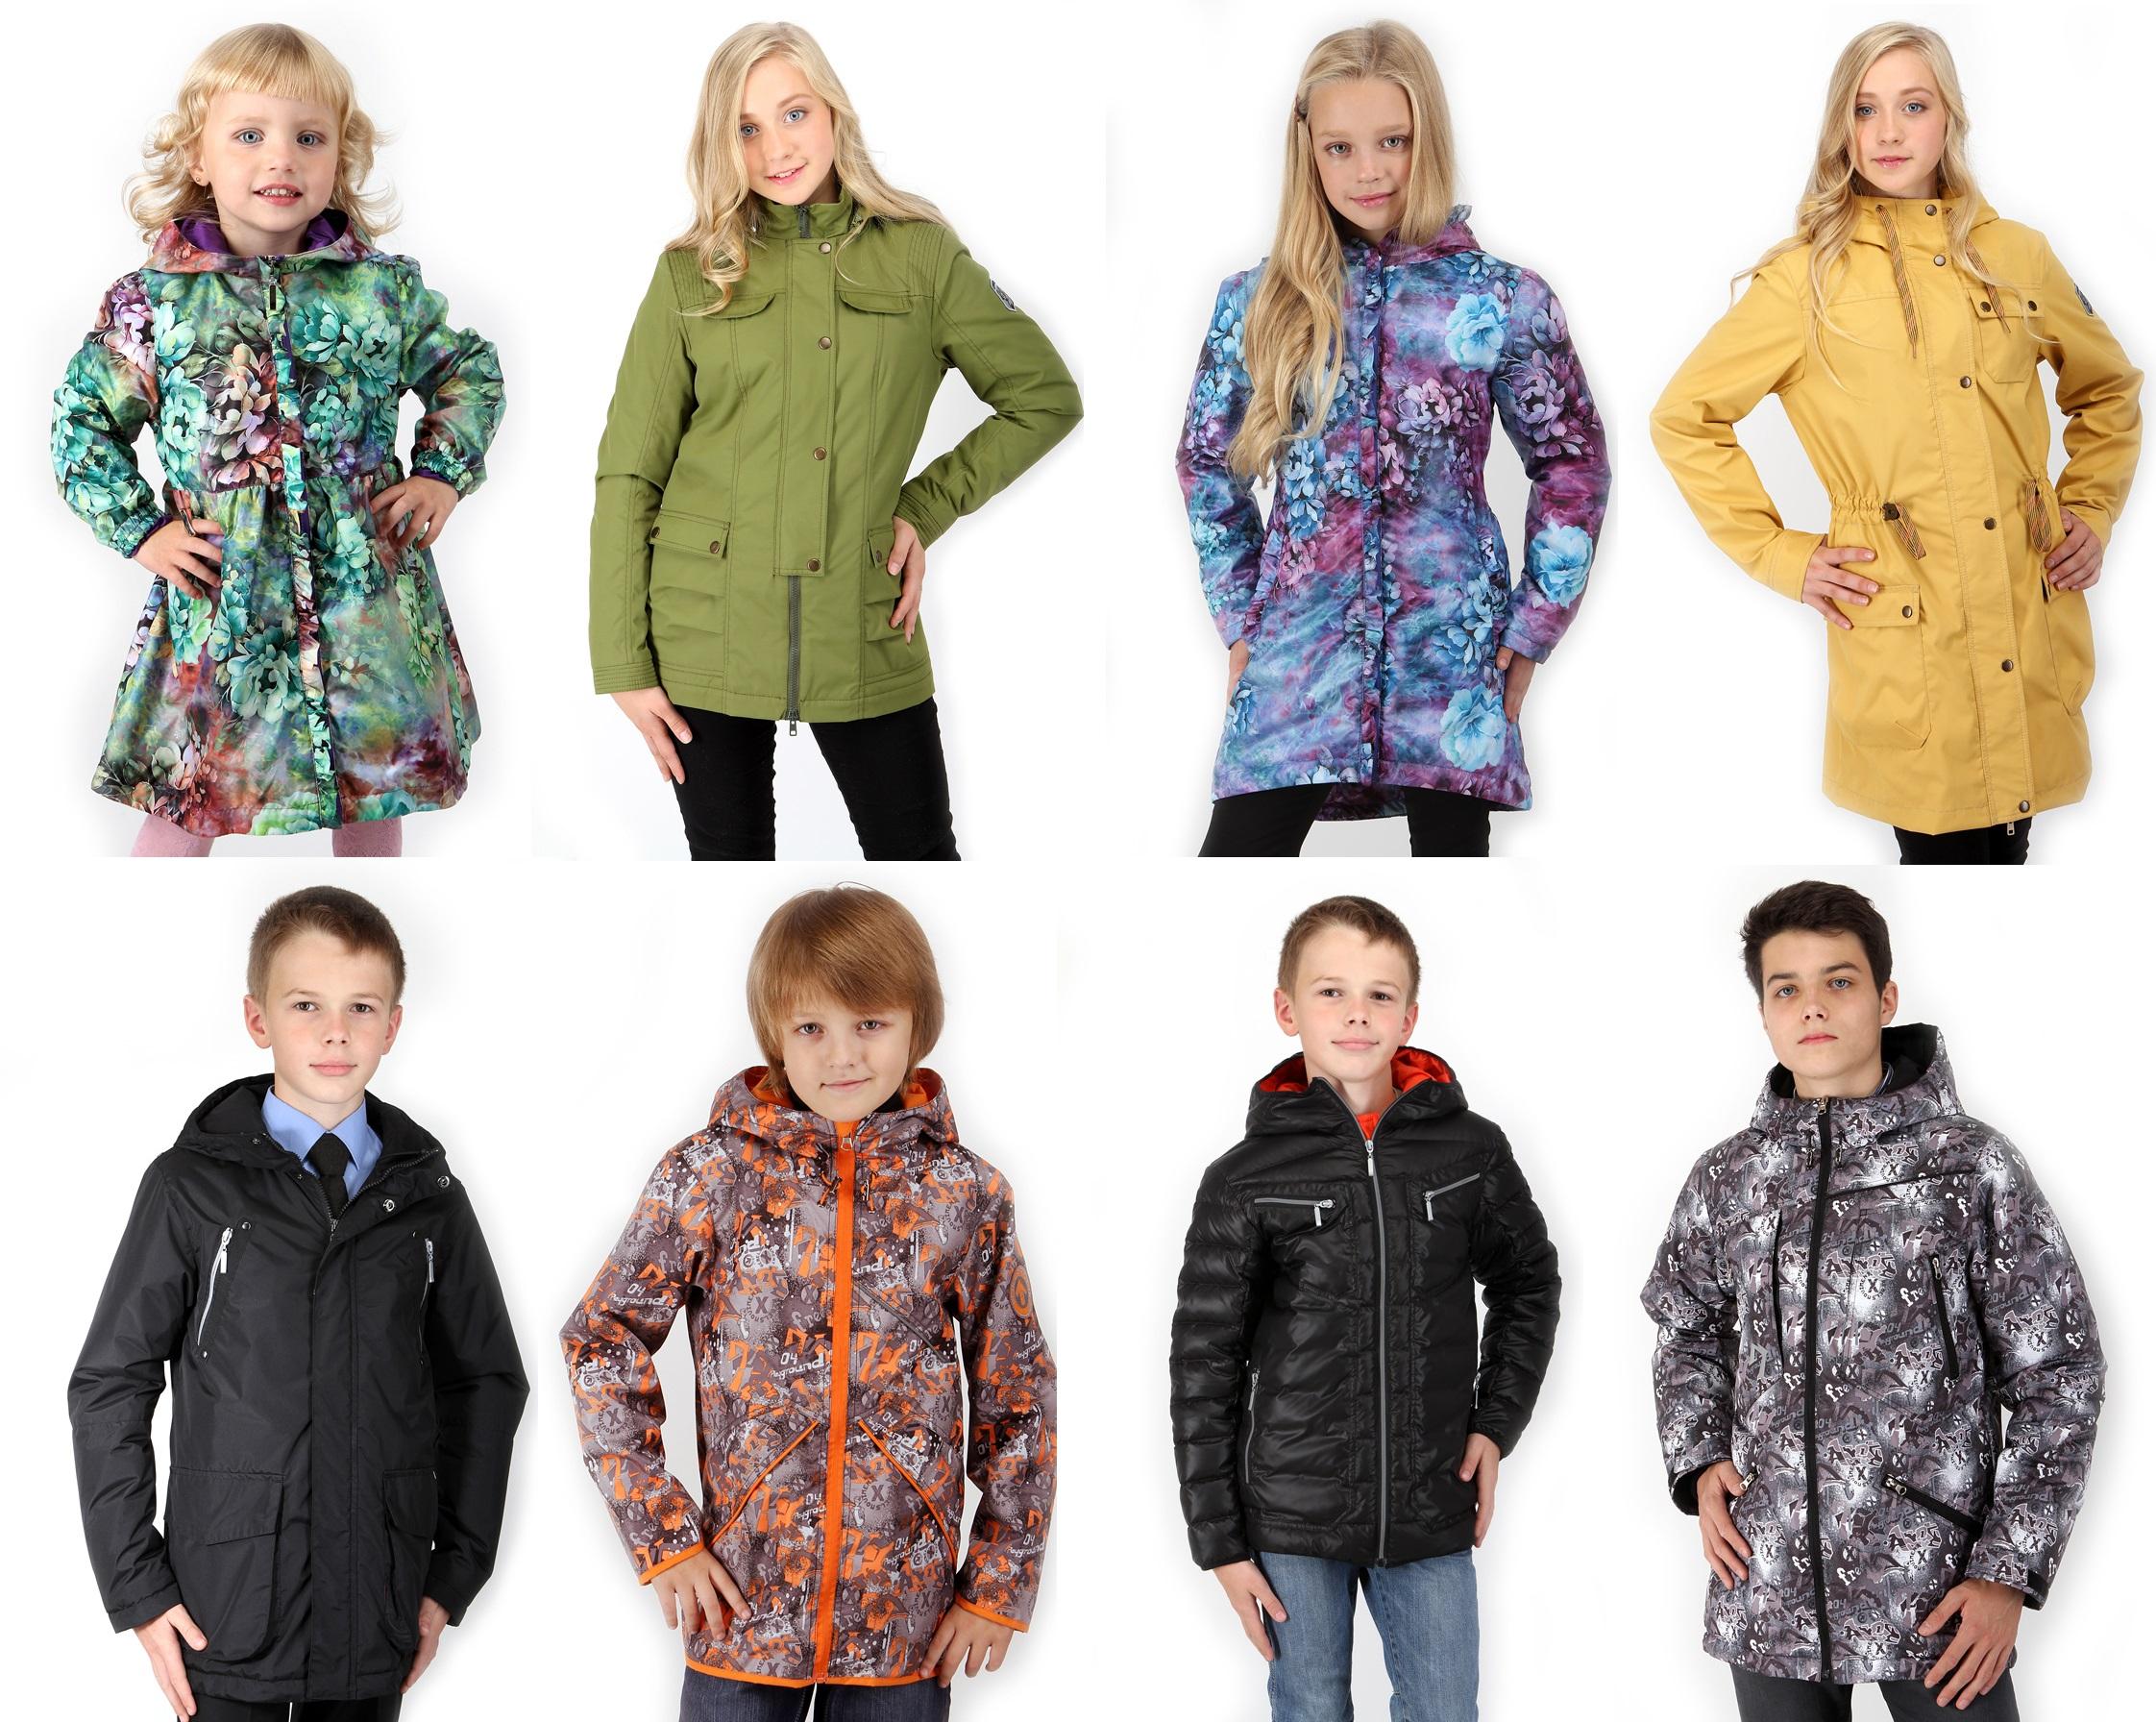 Модnо, классnо, тепlо и безопасnо - 24. От 86 до 176 размера. Весна 2015 парки - куртки, парки-ветровки. Есть распродажа!!! Без рядов!